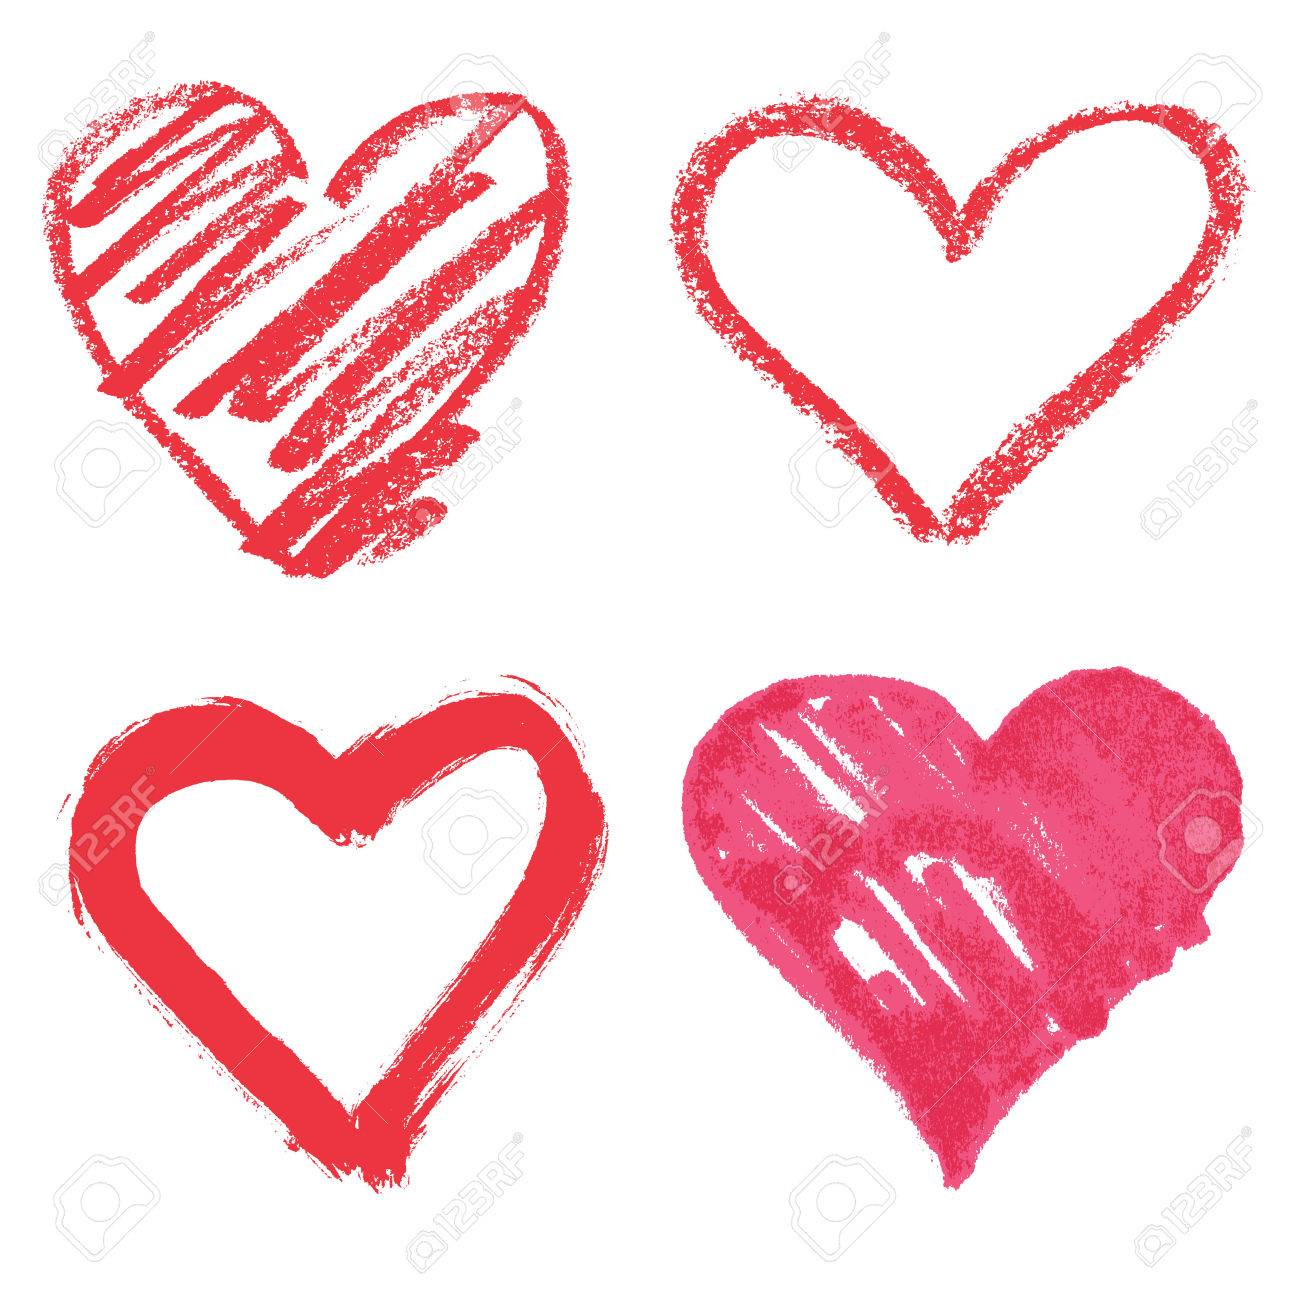 Vector heart set - 51580577